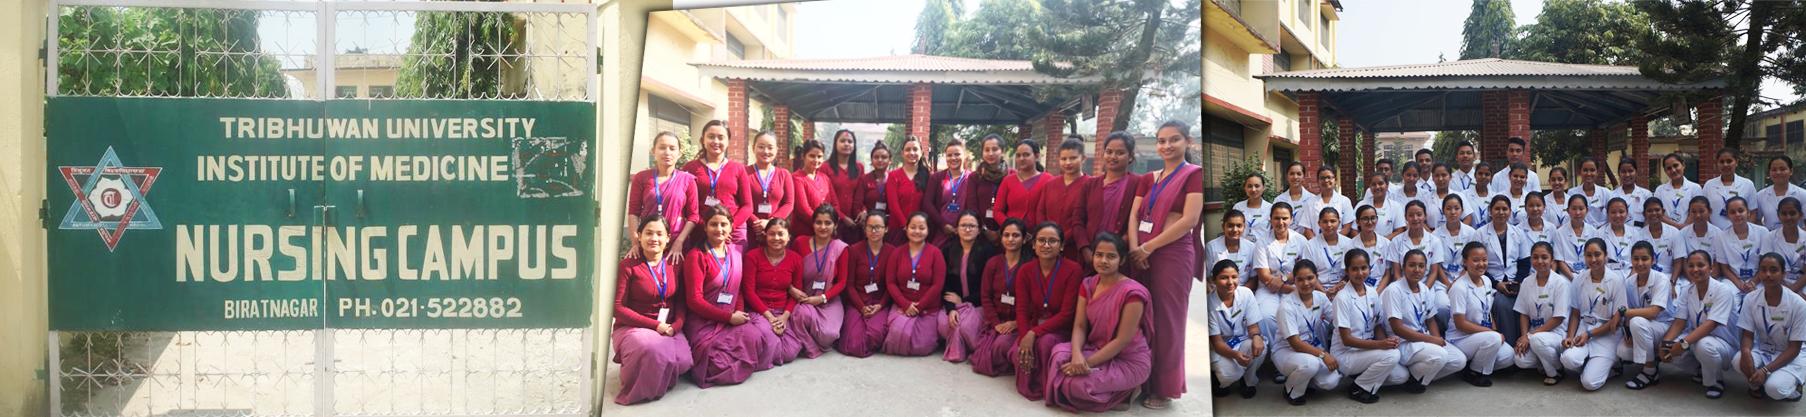 Biratnagar Nursing Campus